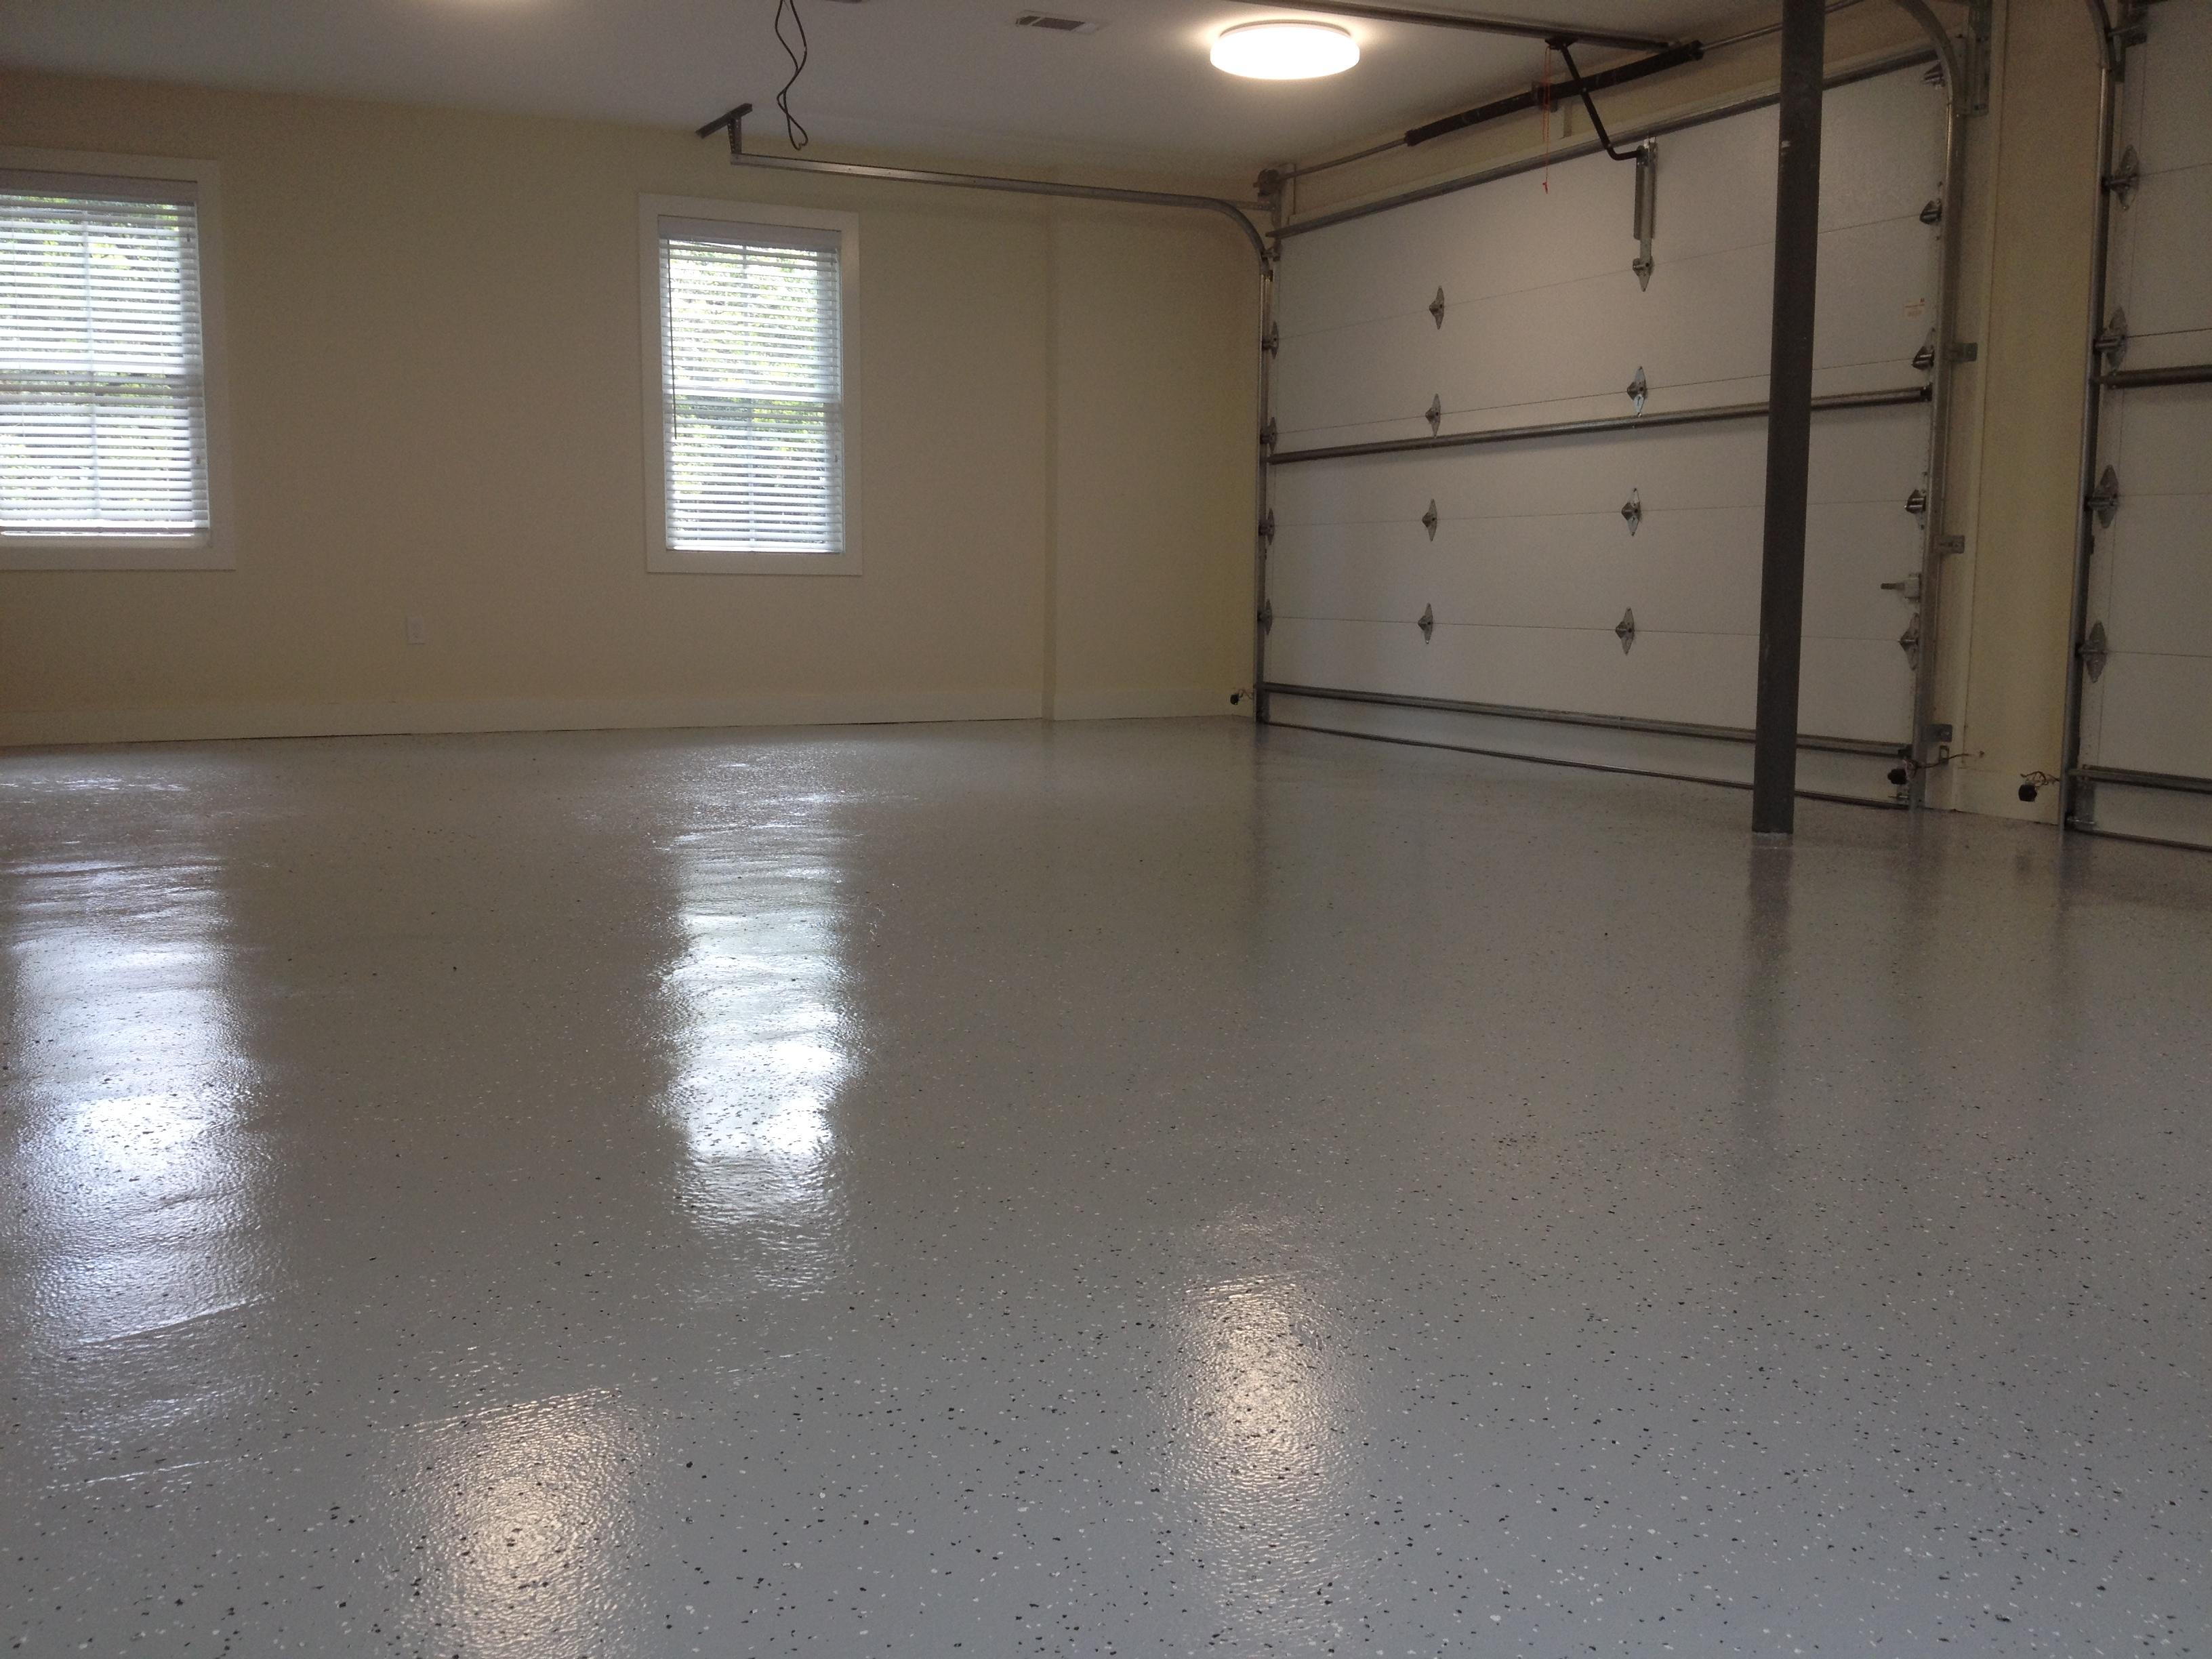 Epoxy floor completed